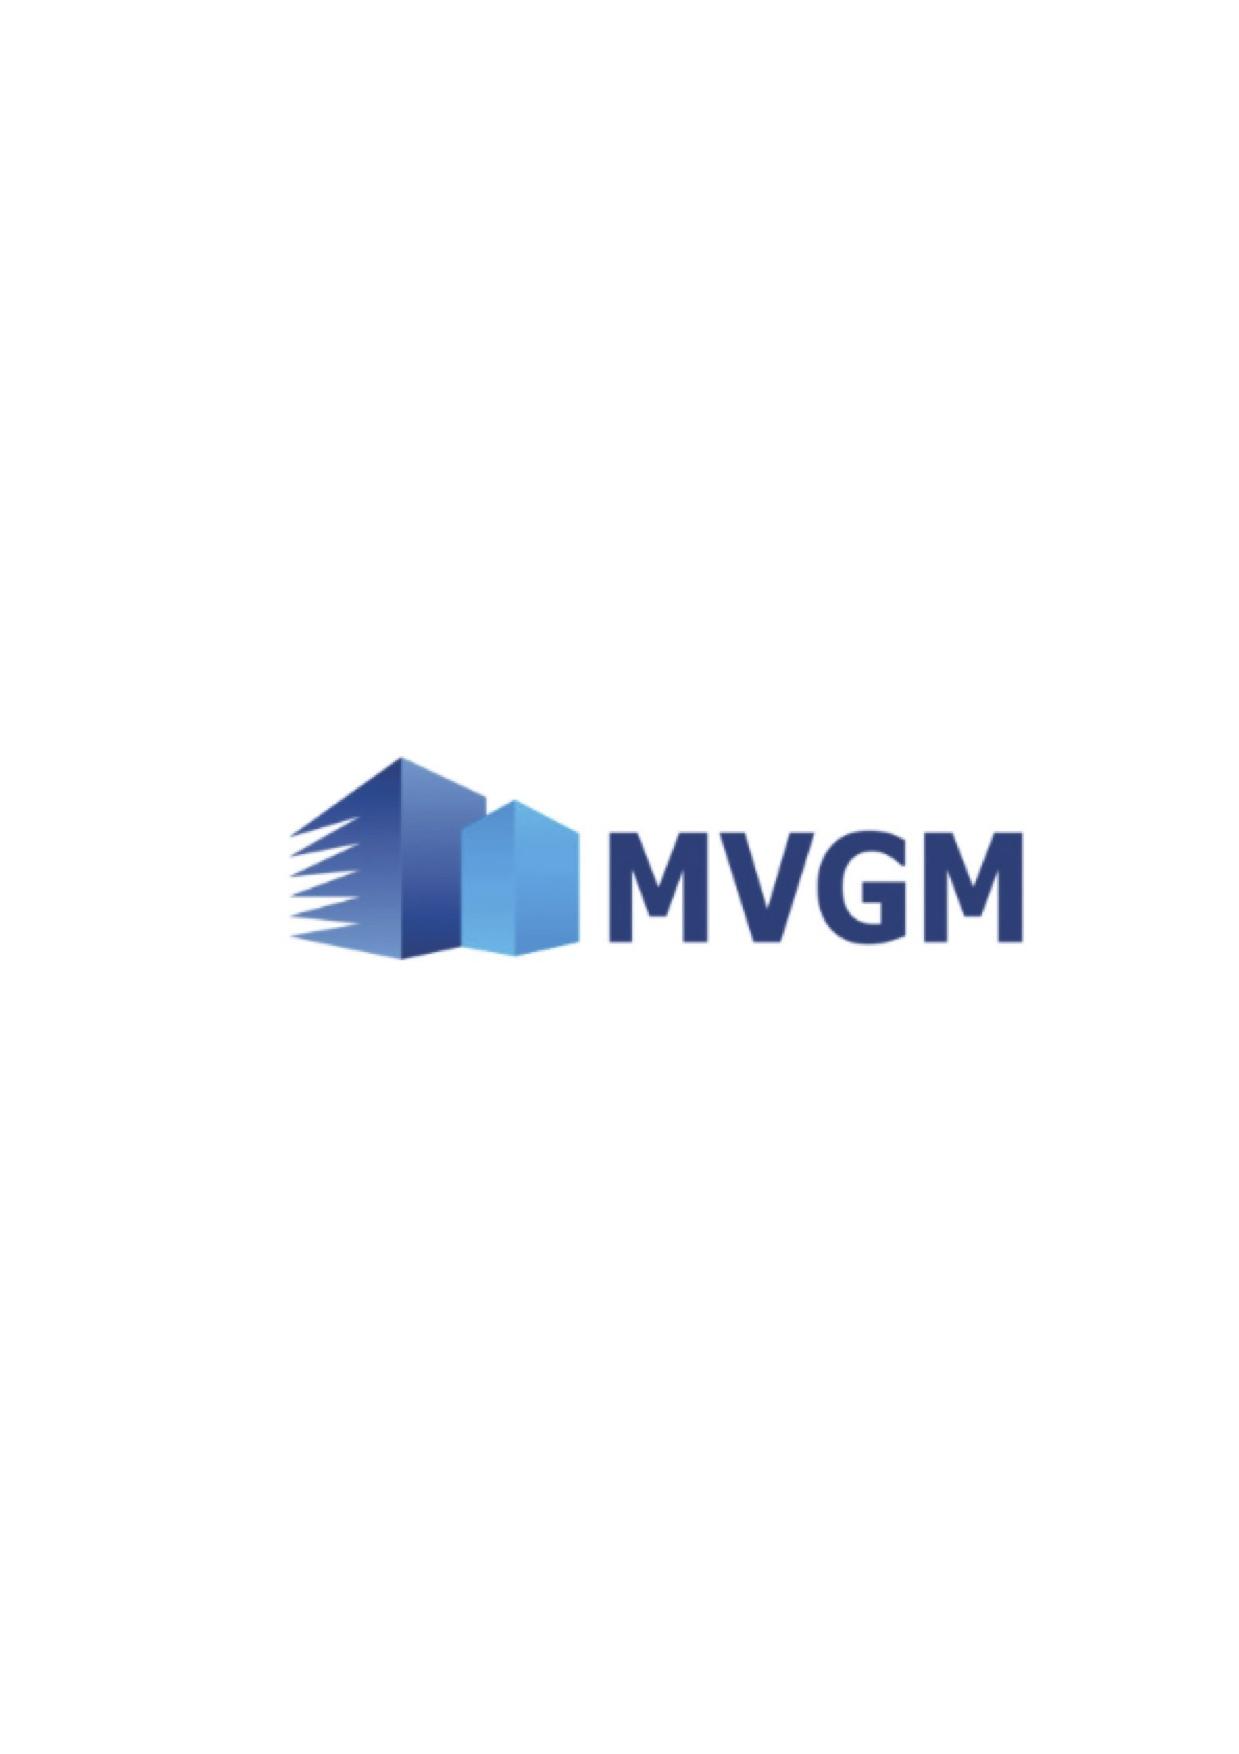 #018 | MVGM